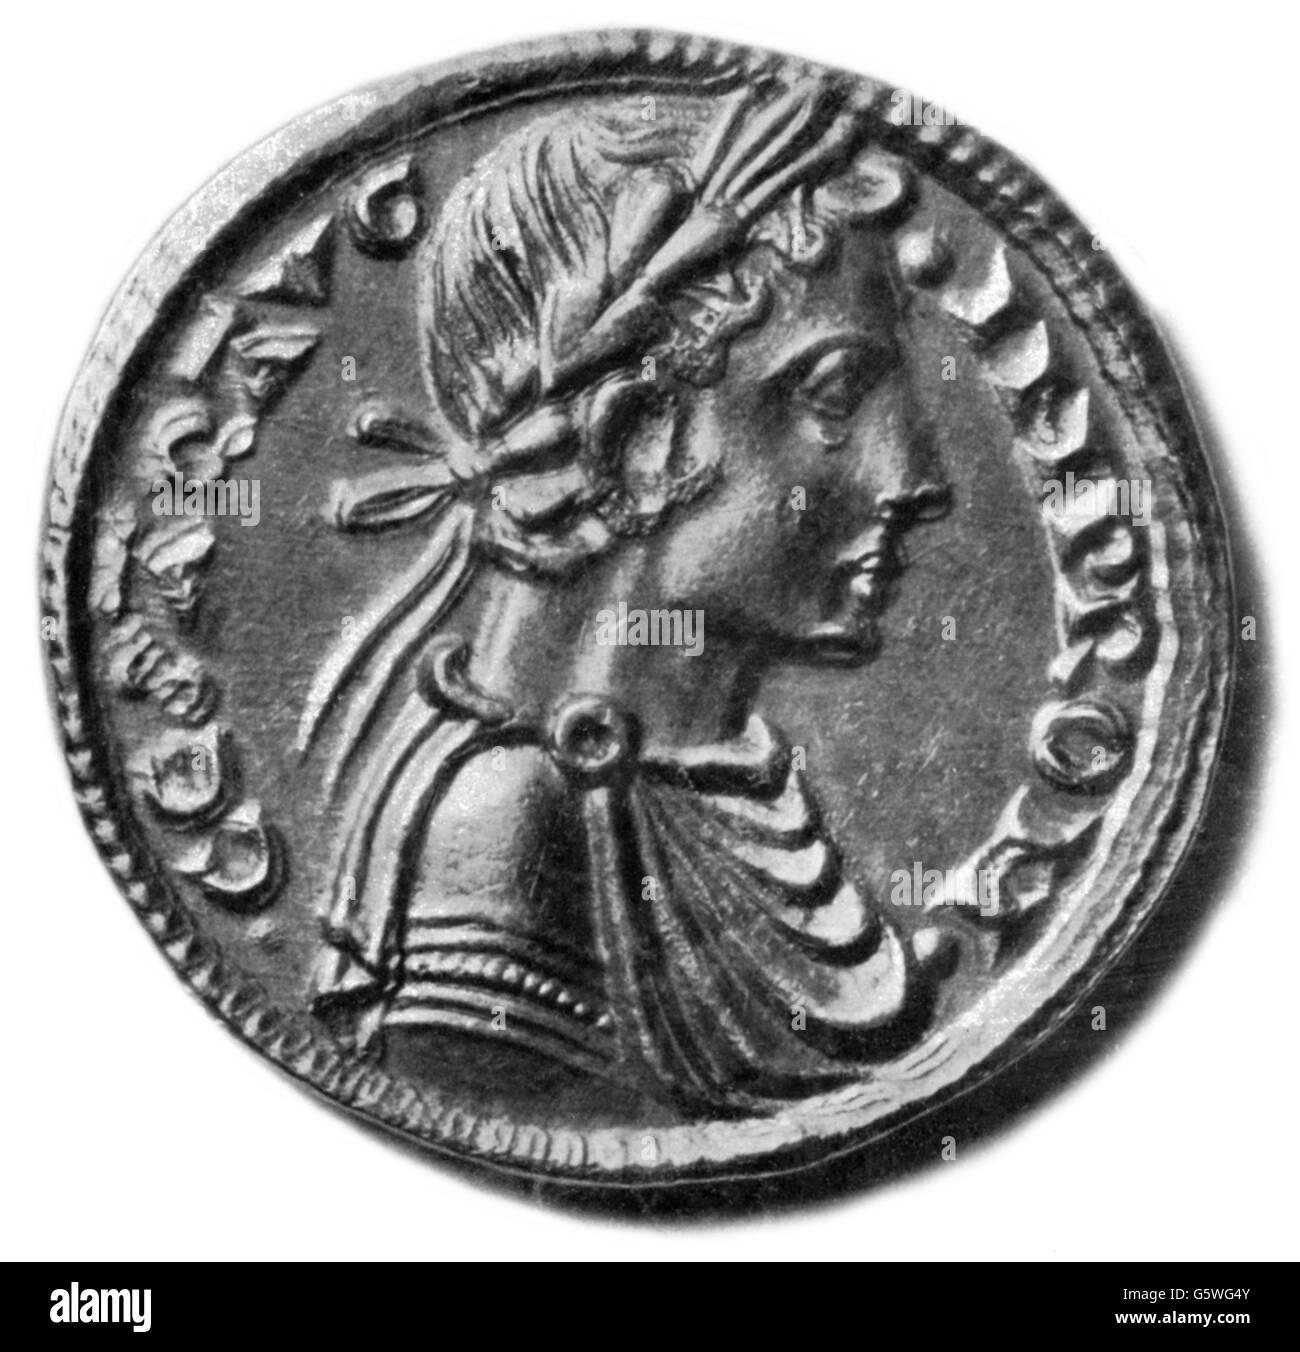 Frederick II, 26.12.1194 - 13 12.1250, Holy Roman Emperor 22.11.1220 - 13.12.1250, portrait, coin-portrait, Brindisi, - Stock Image